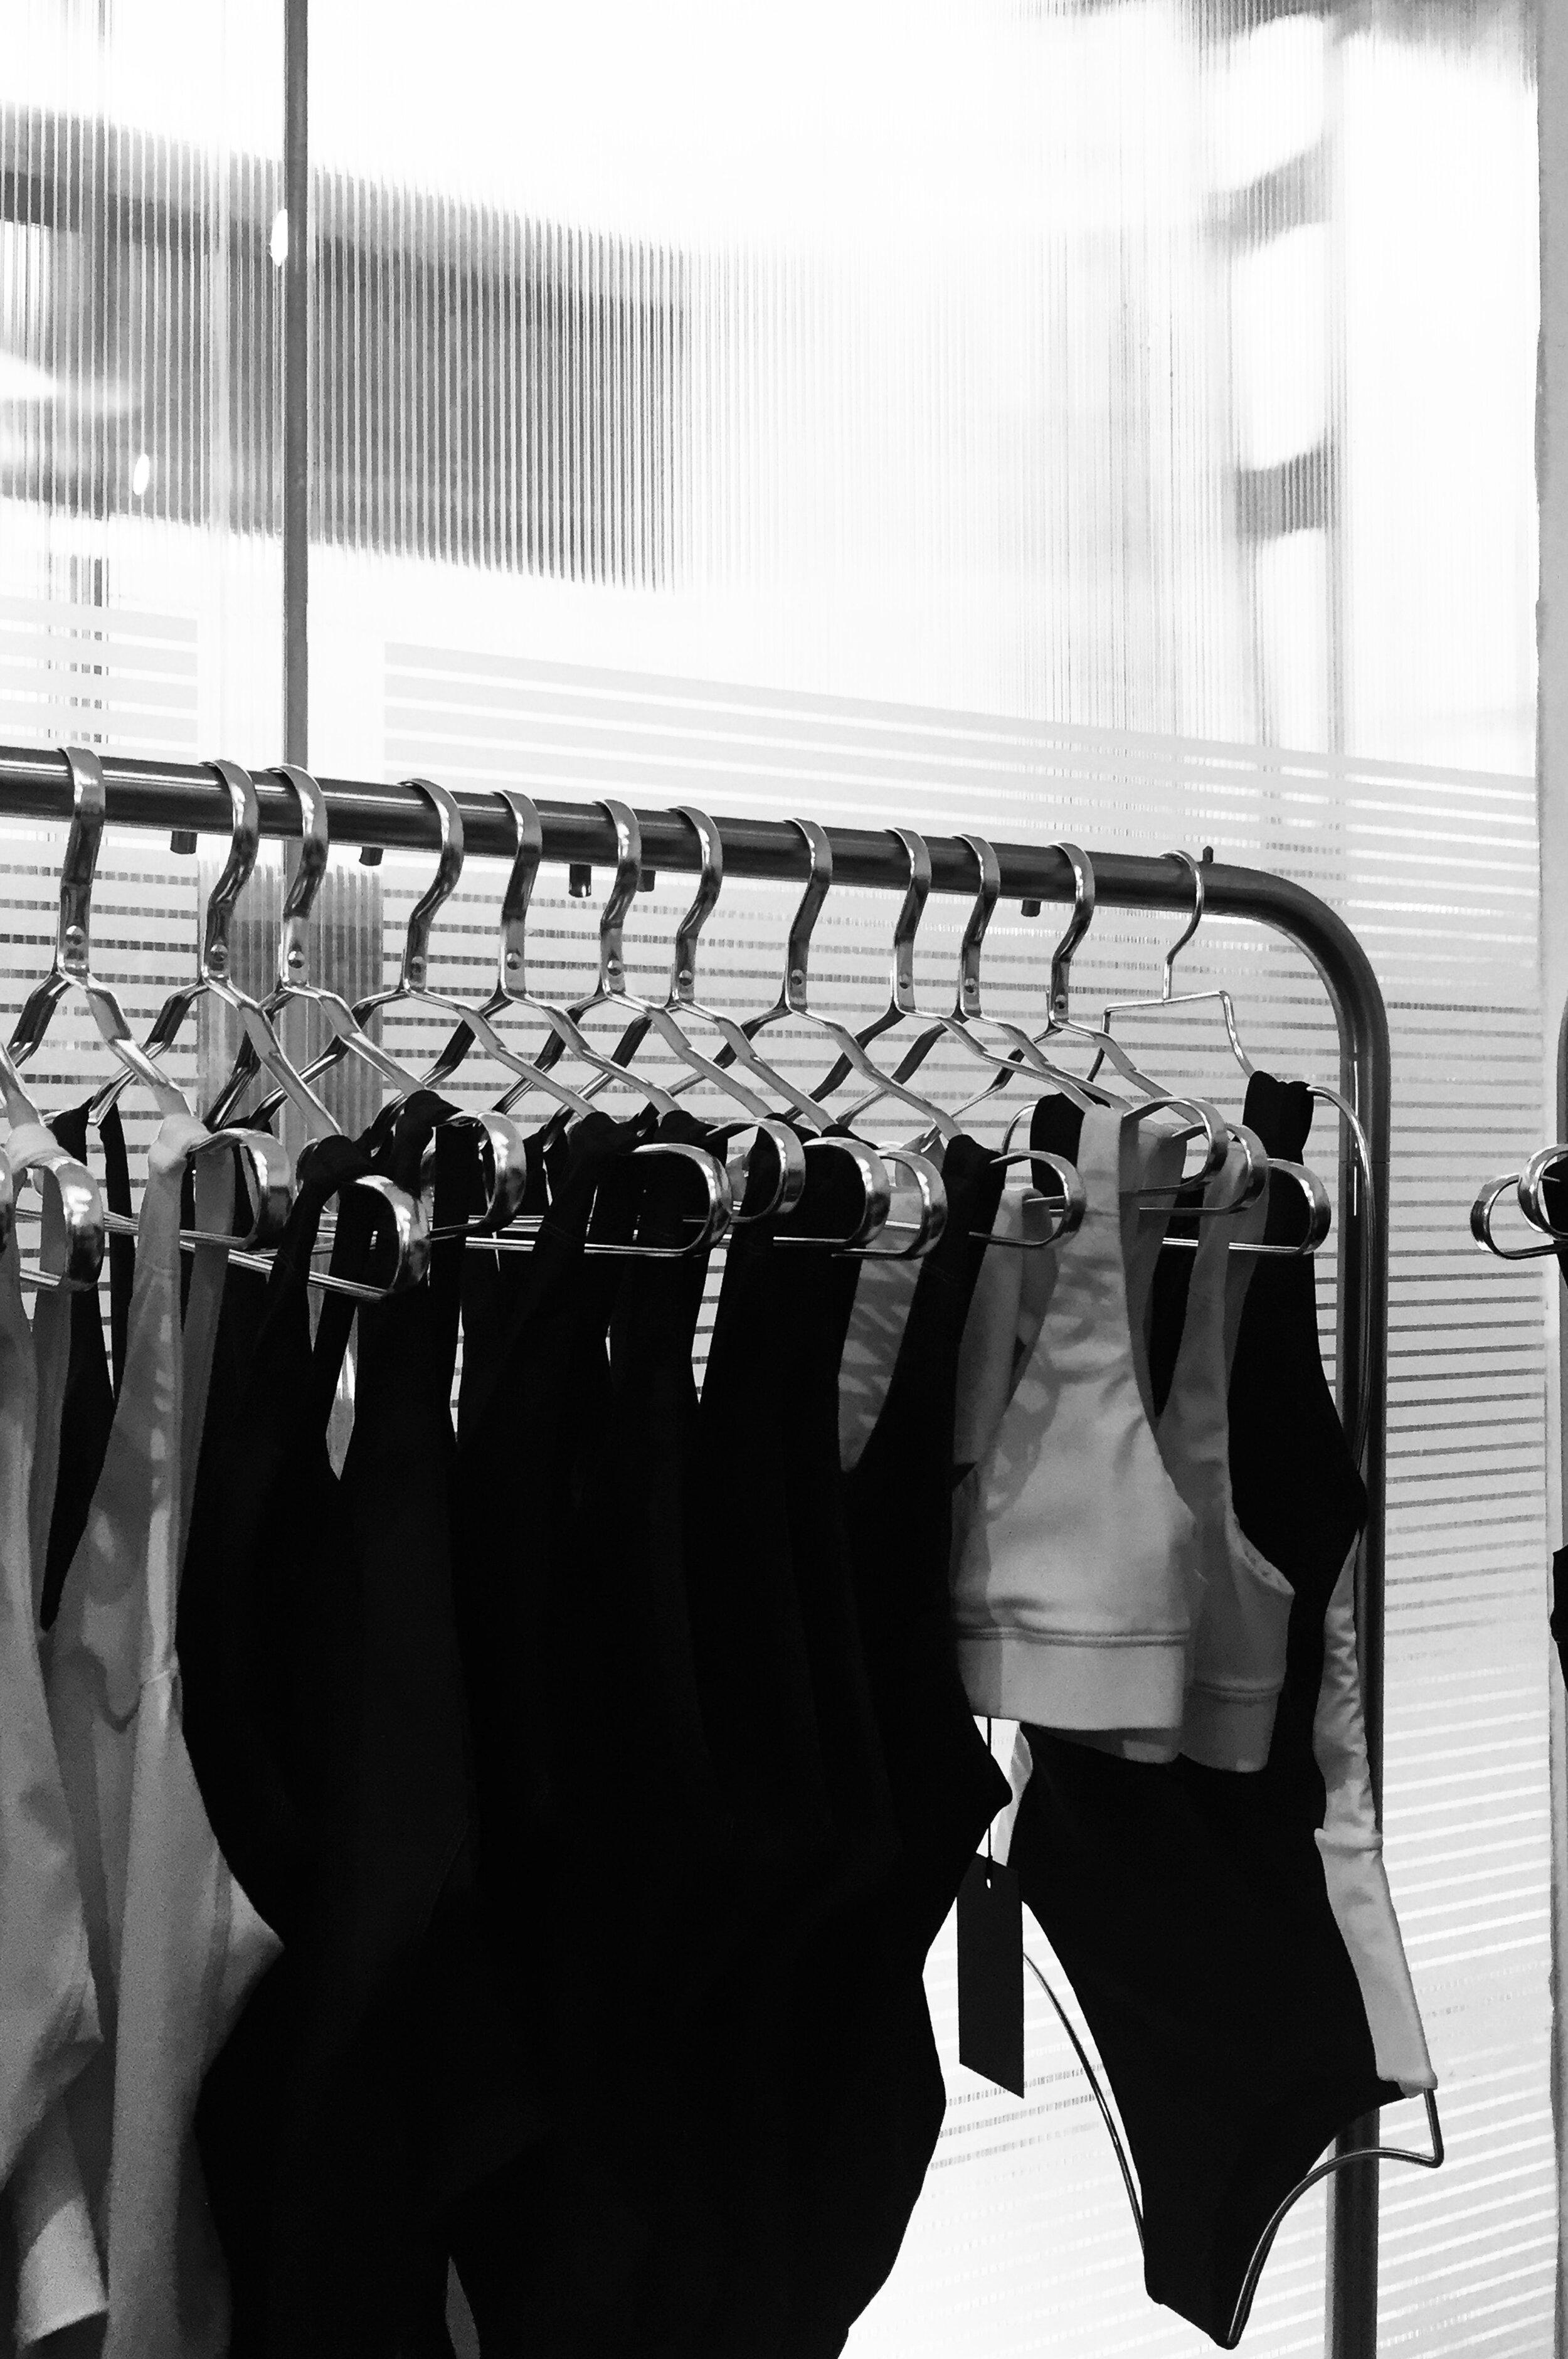 BFC Fashion Exhibition